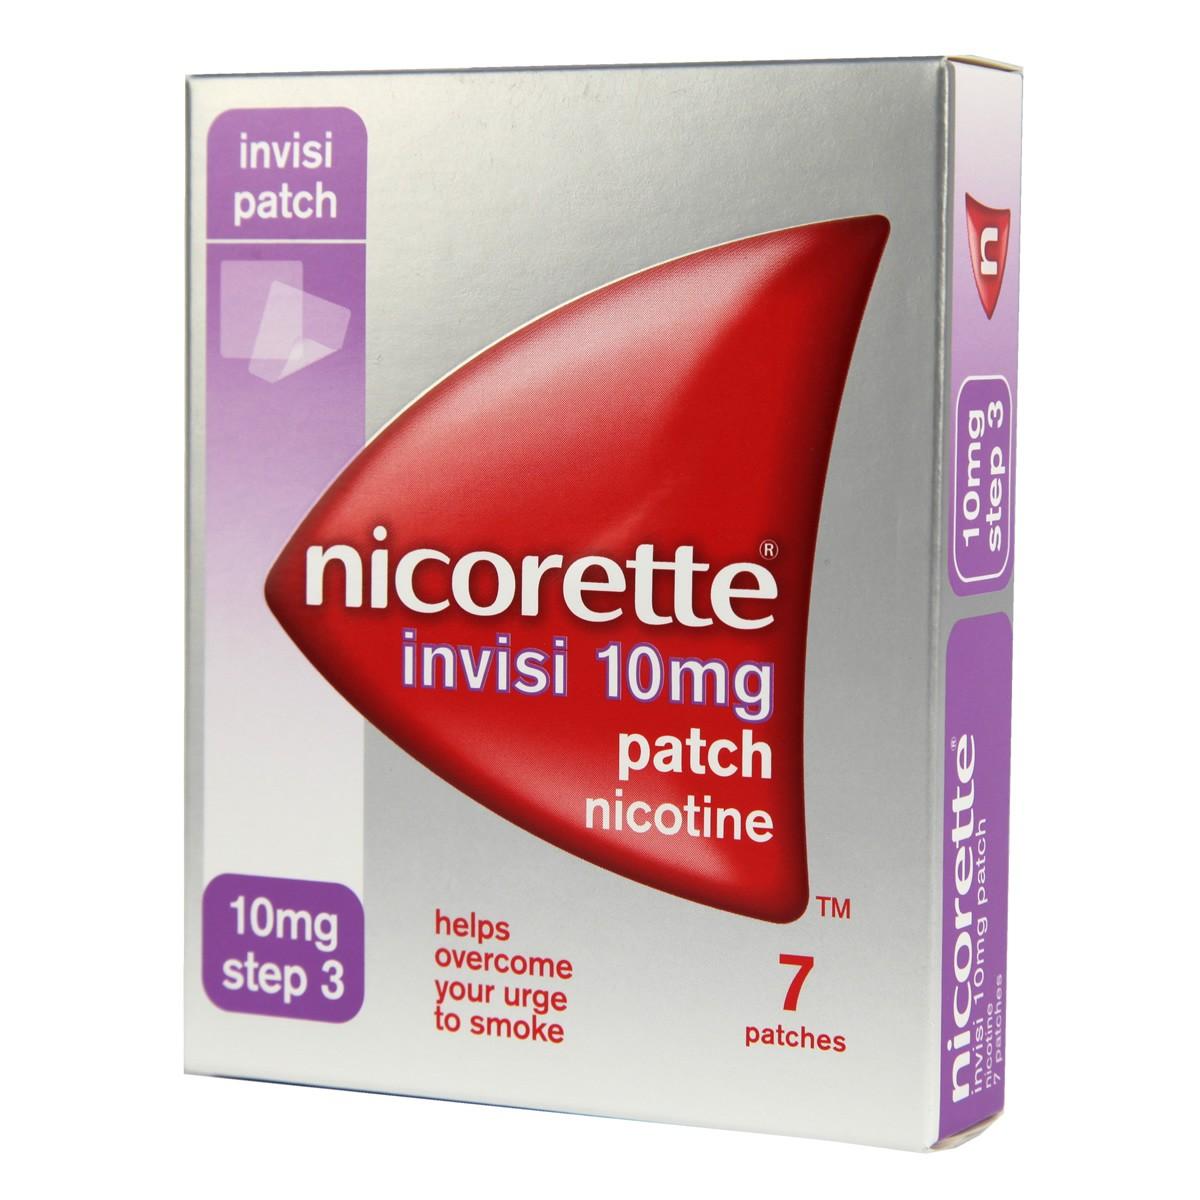 Nicorette Invisi Patch Step 3 - 10mg